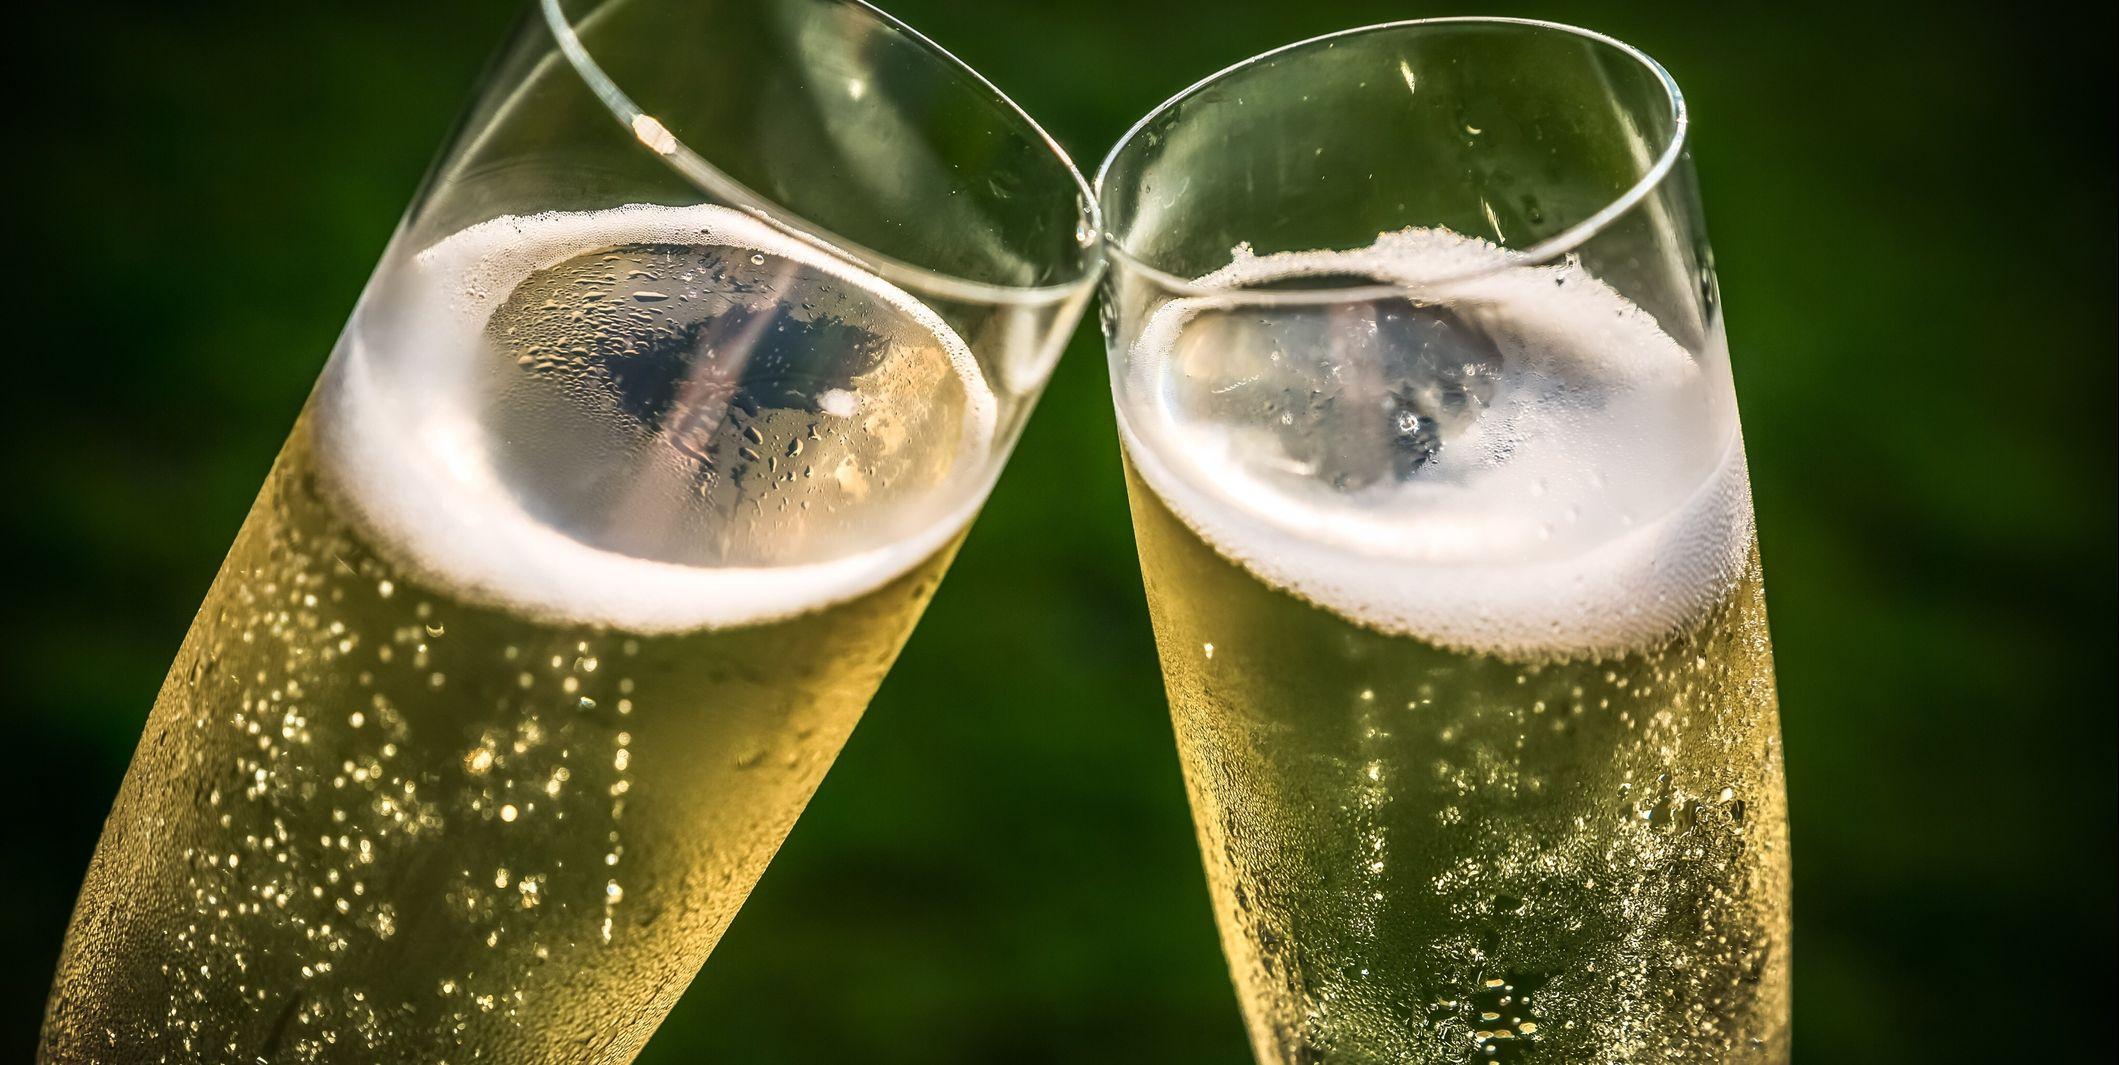 Aldi champagne magnum